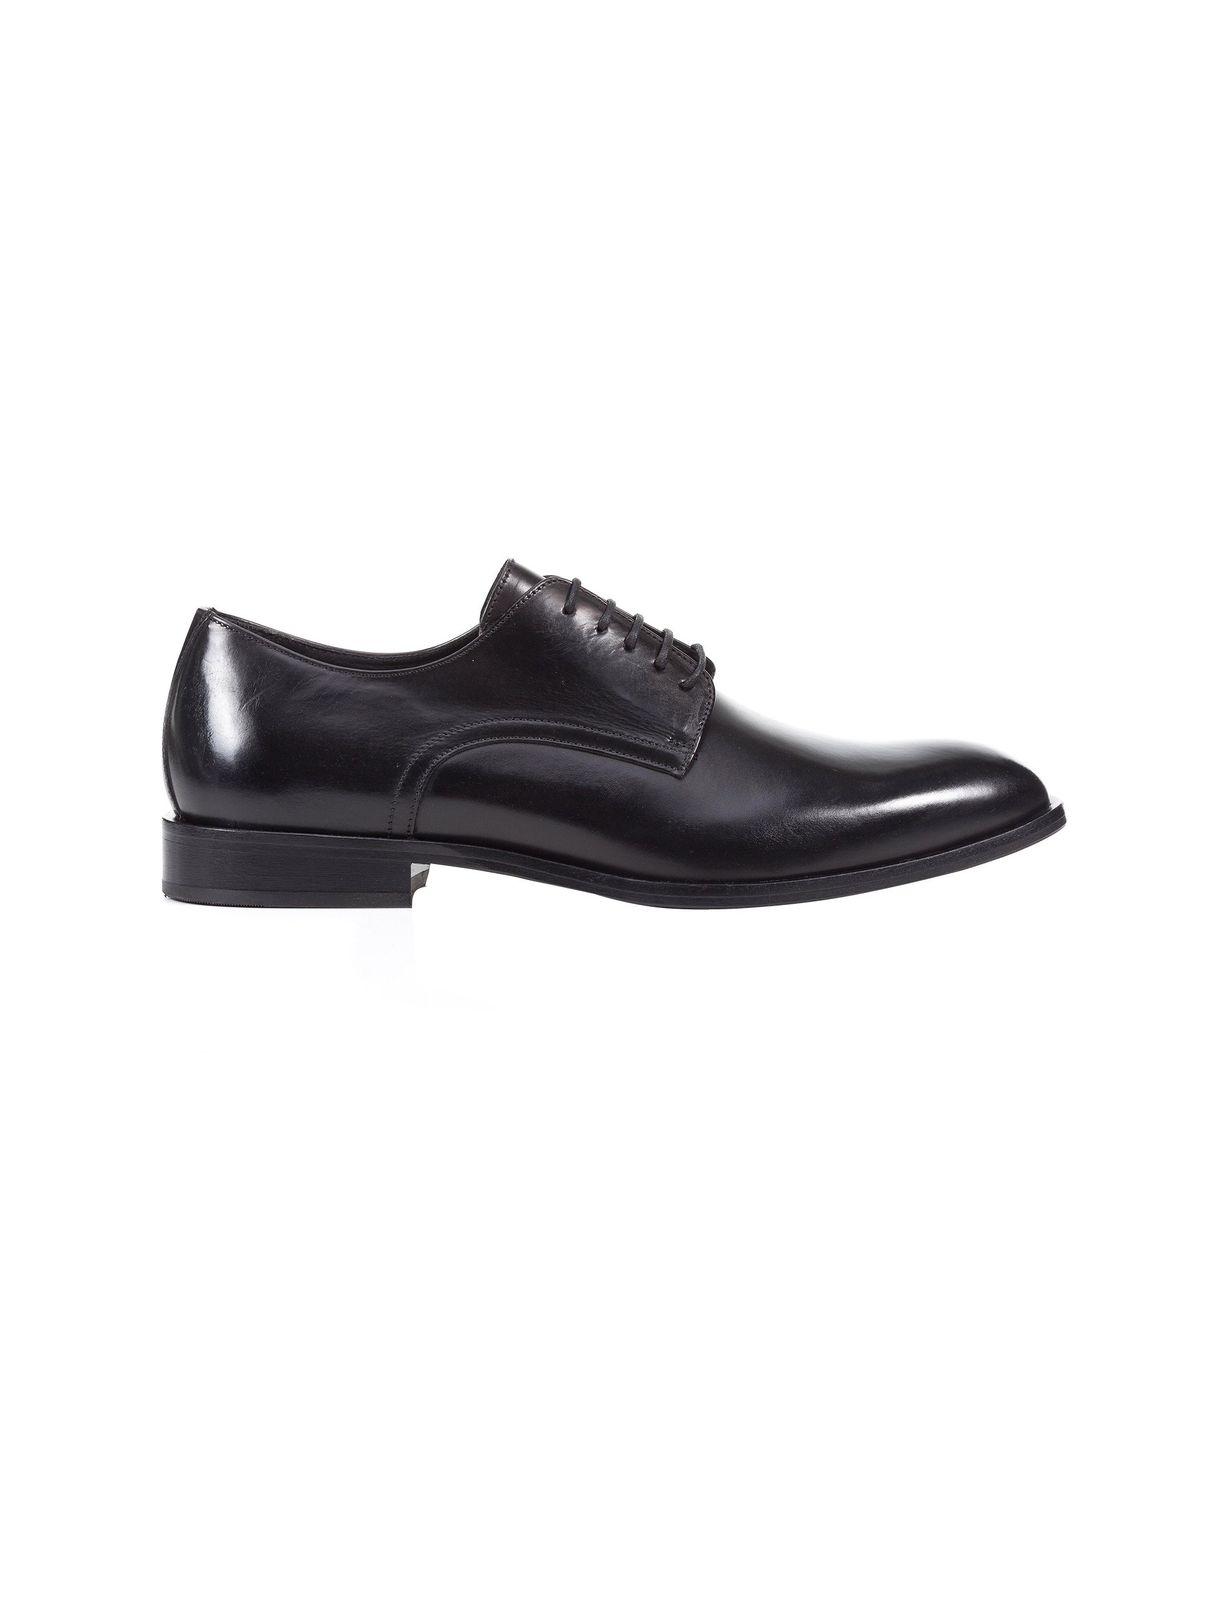 کفش اداری چرم مردانه Saymore C – جی اوکس  Men Casual Office Leather Shoes Saymore C – Geox